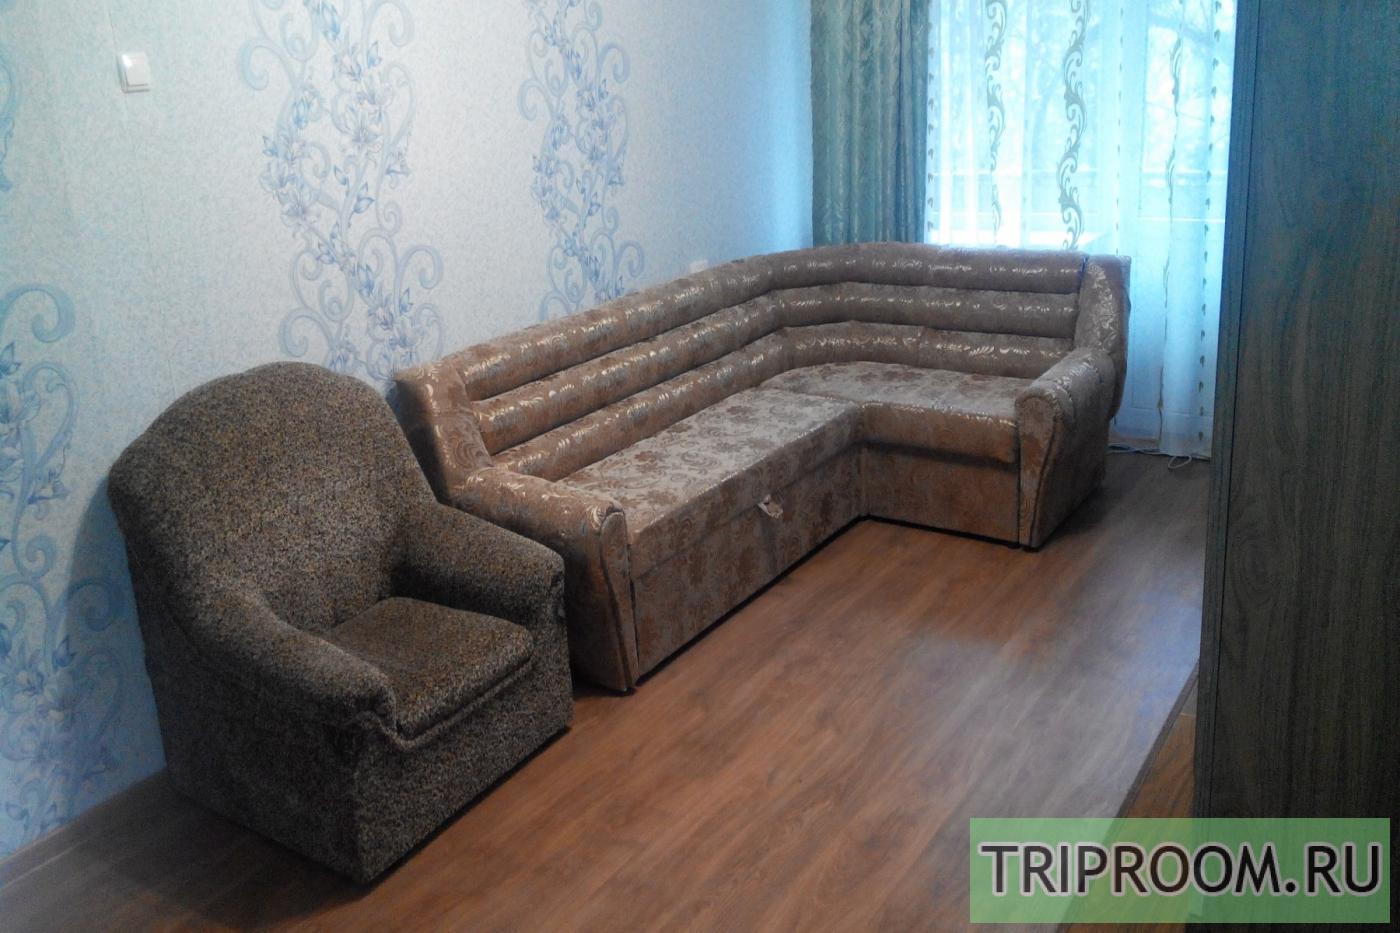 3-комнатная квартира посуточно (вариант № 30860), ул. Гагарина улица, фото № 2